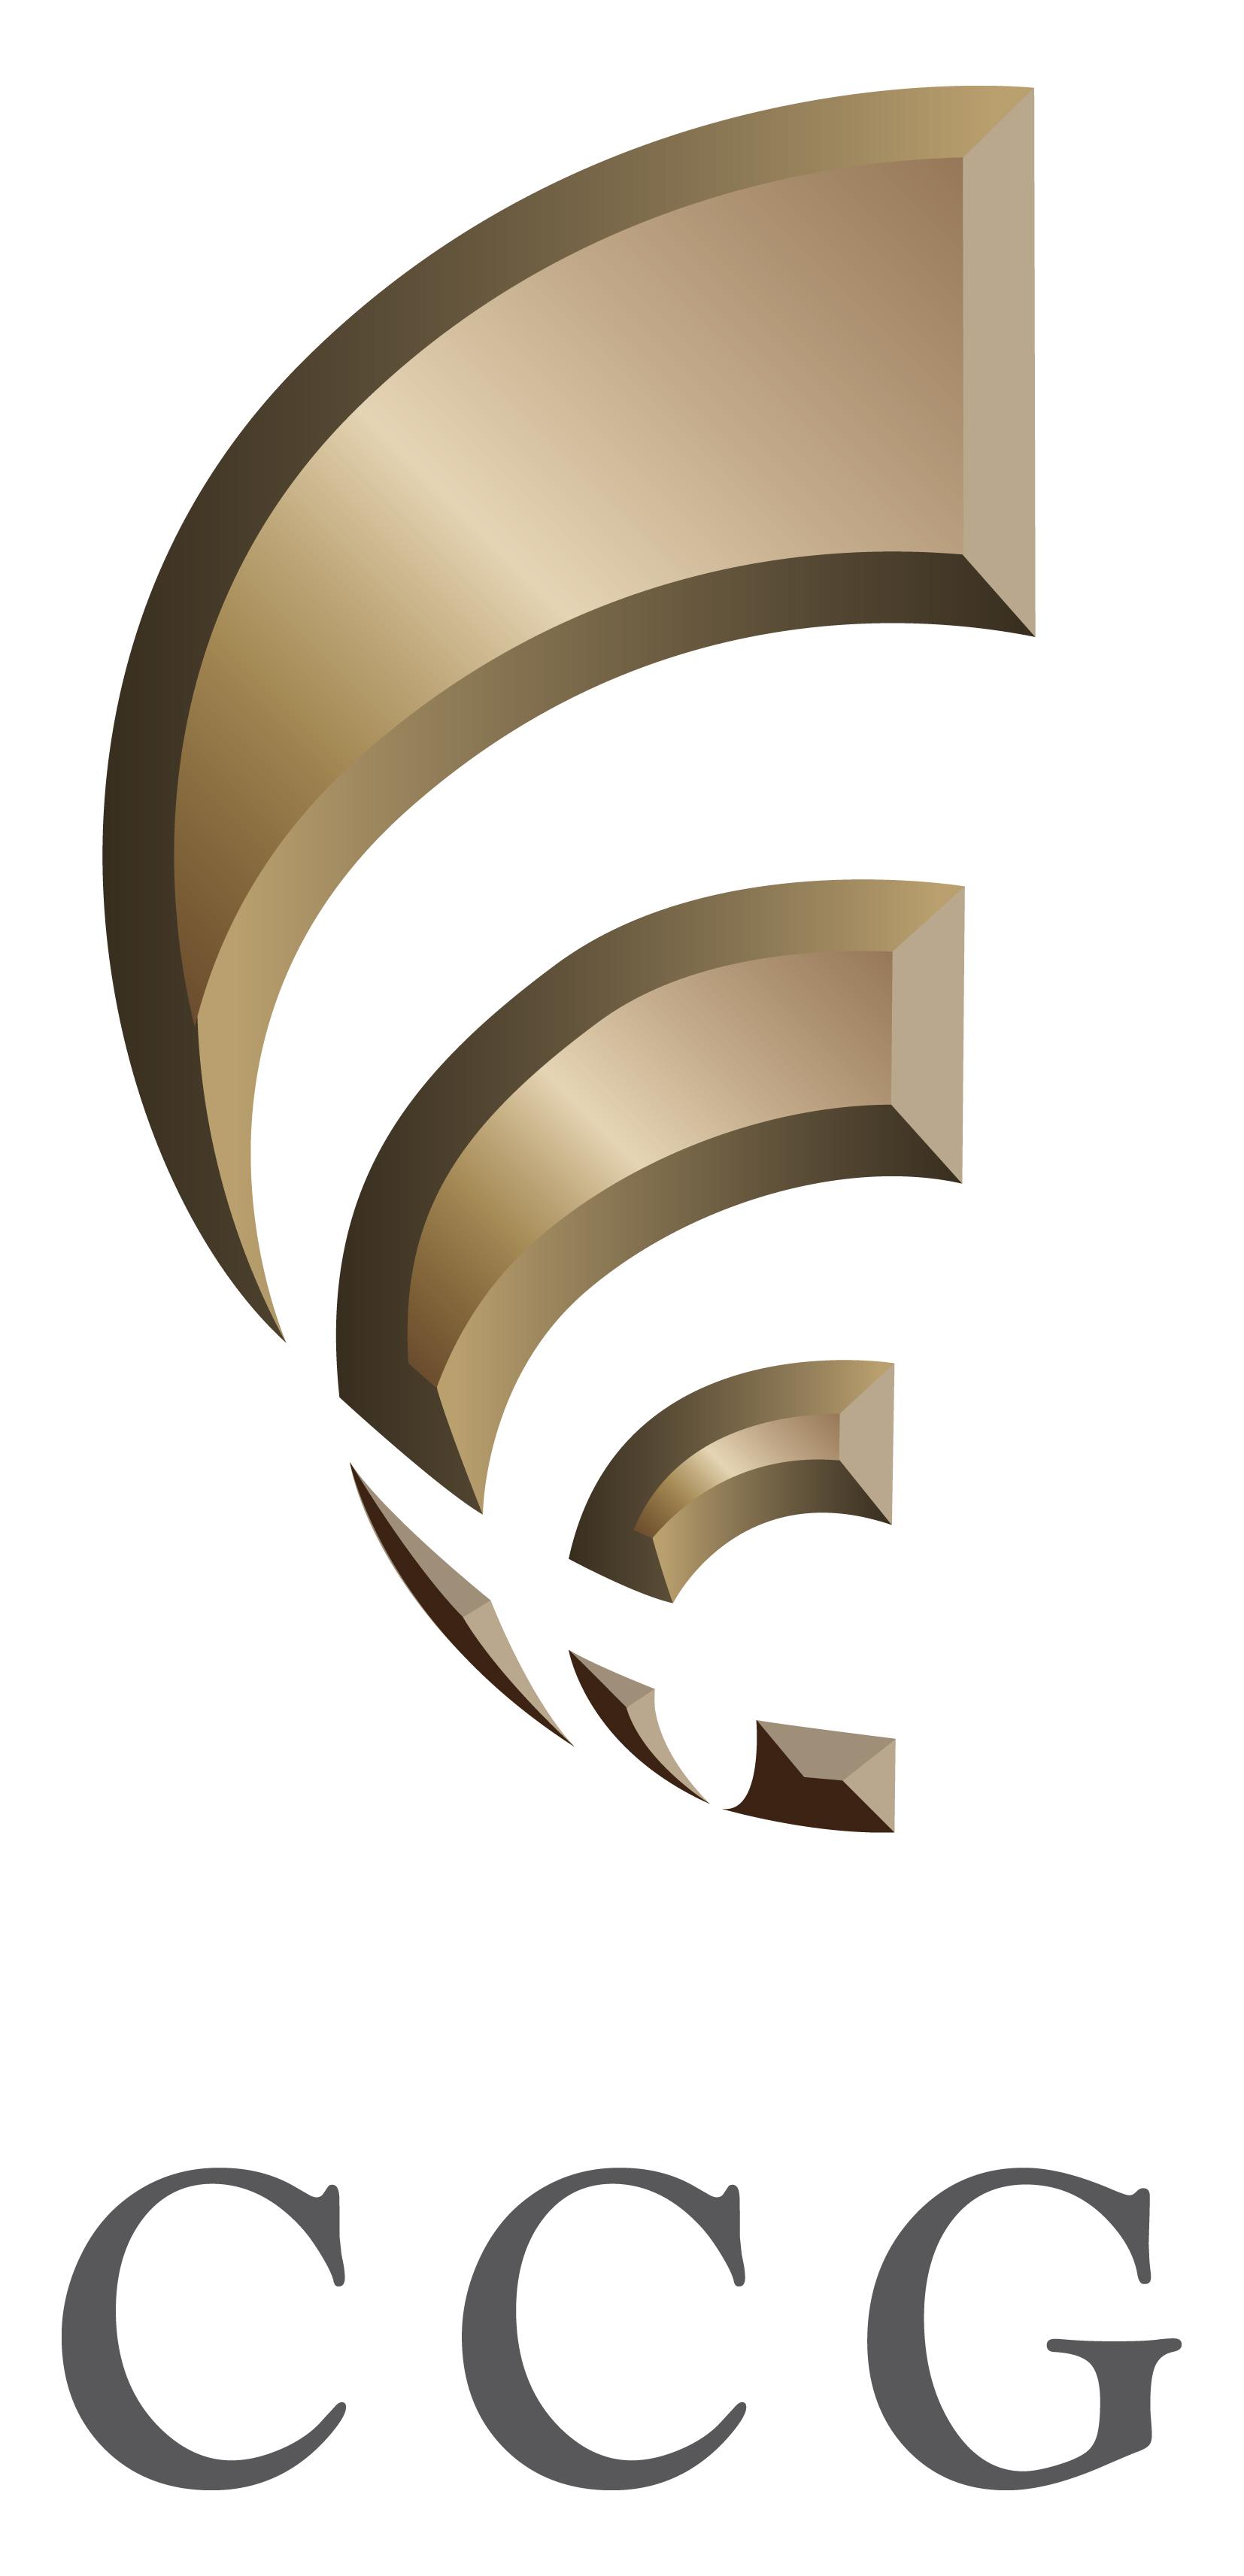 CCG (Scotland) Ltd